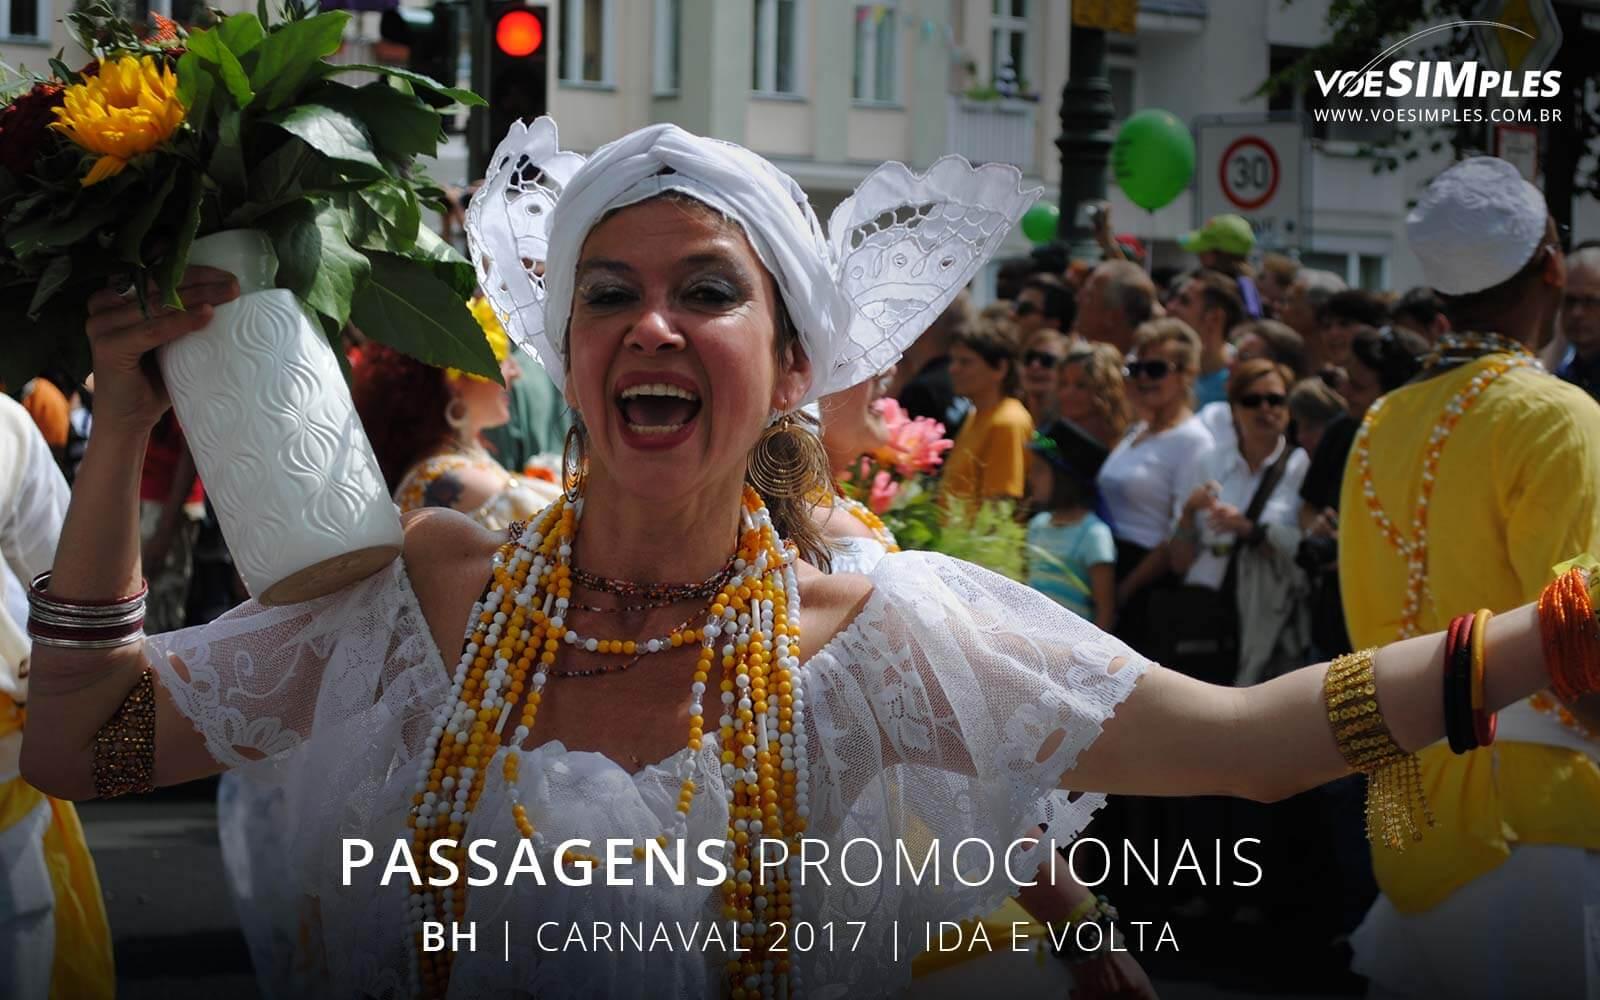 passagens-aereas-baratas-carnaval-voe-simples-passages-aereas-promocionais-carnaval-passagens-promo-carnaval